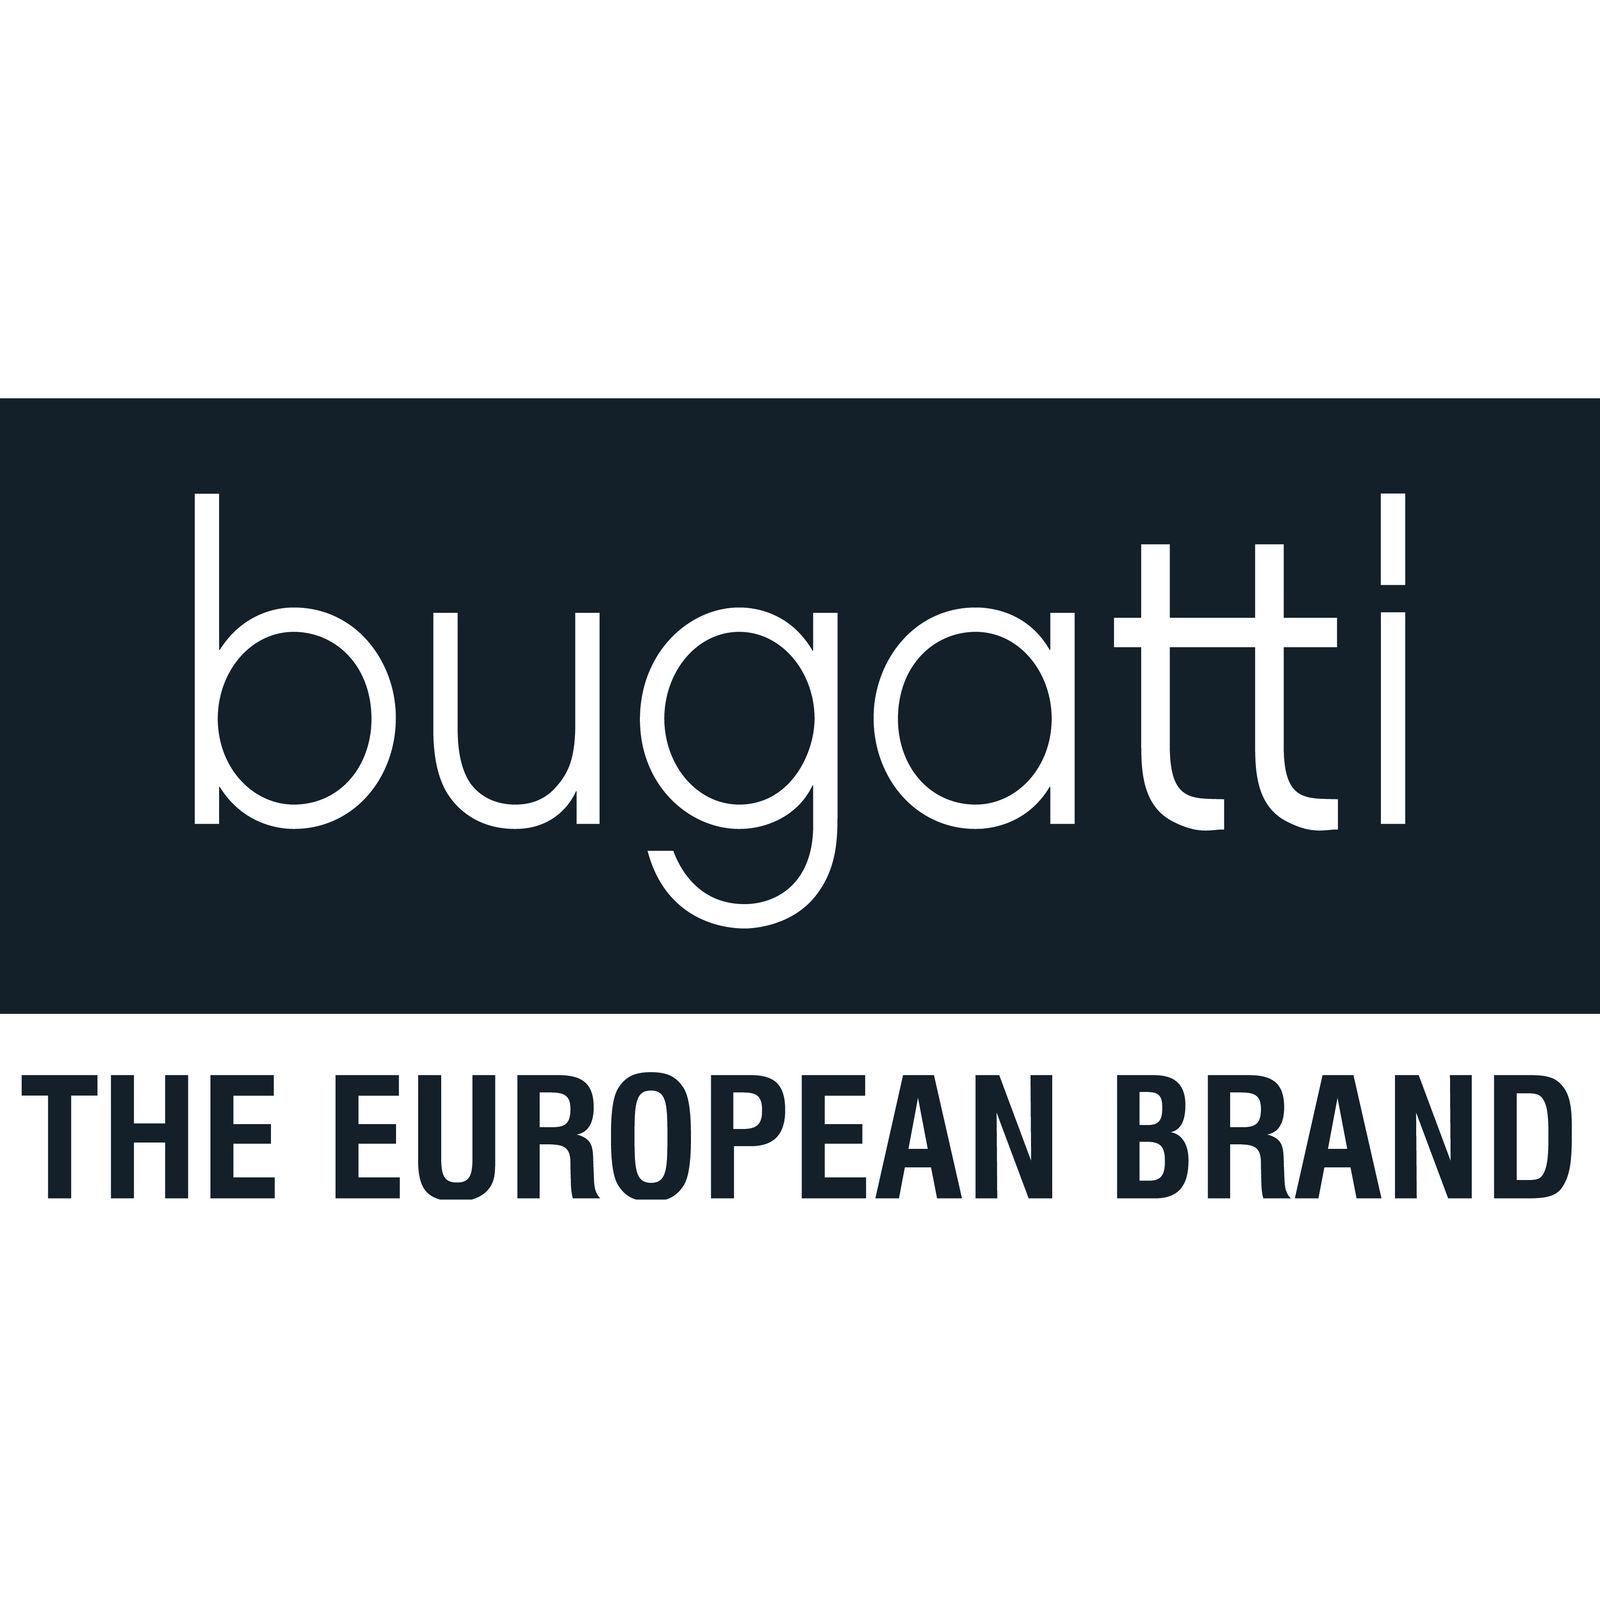 bugatti (Bild 1)